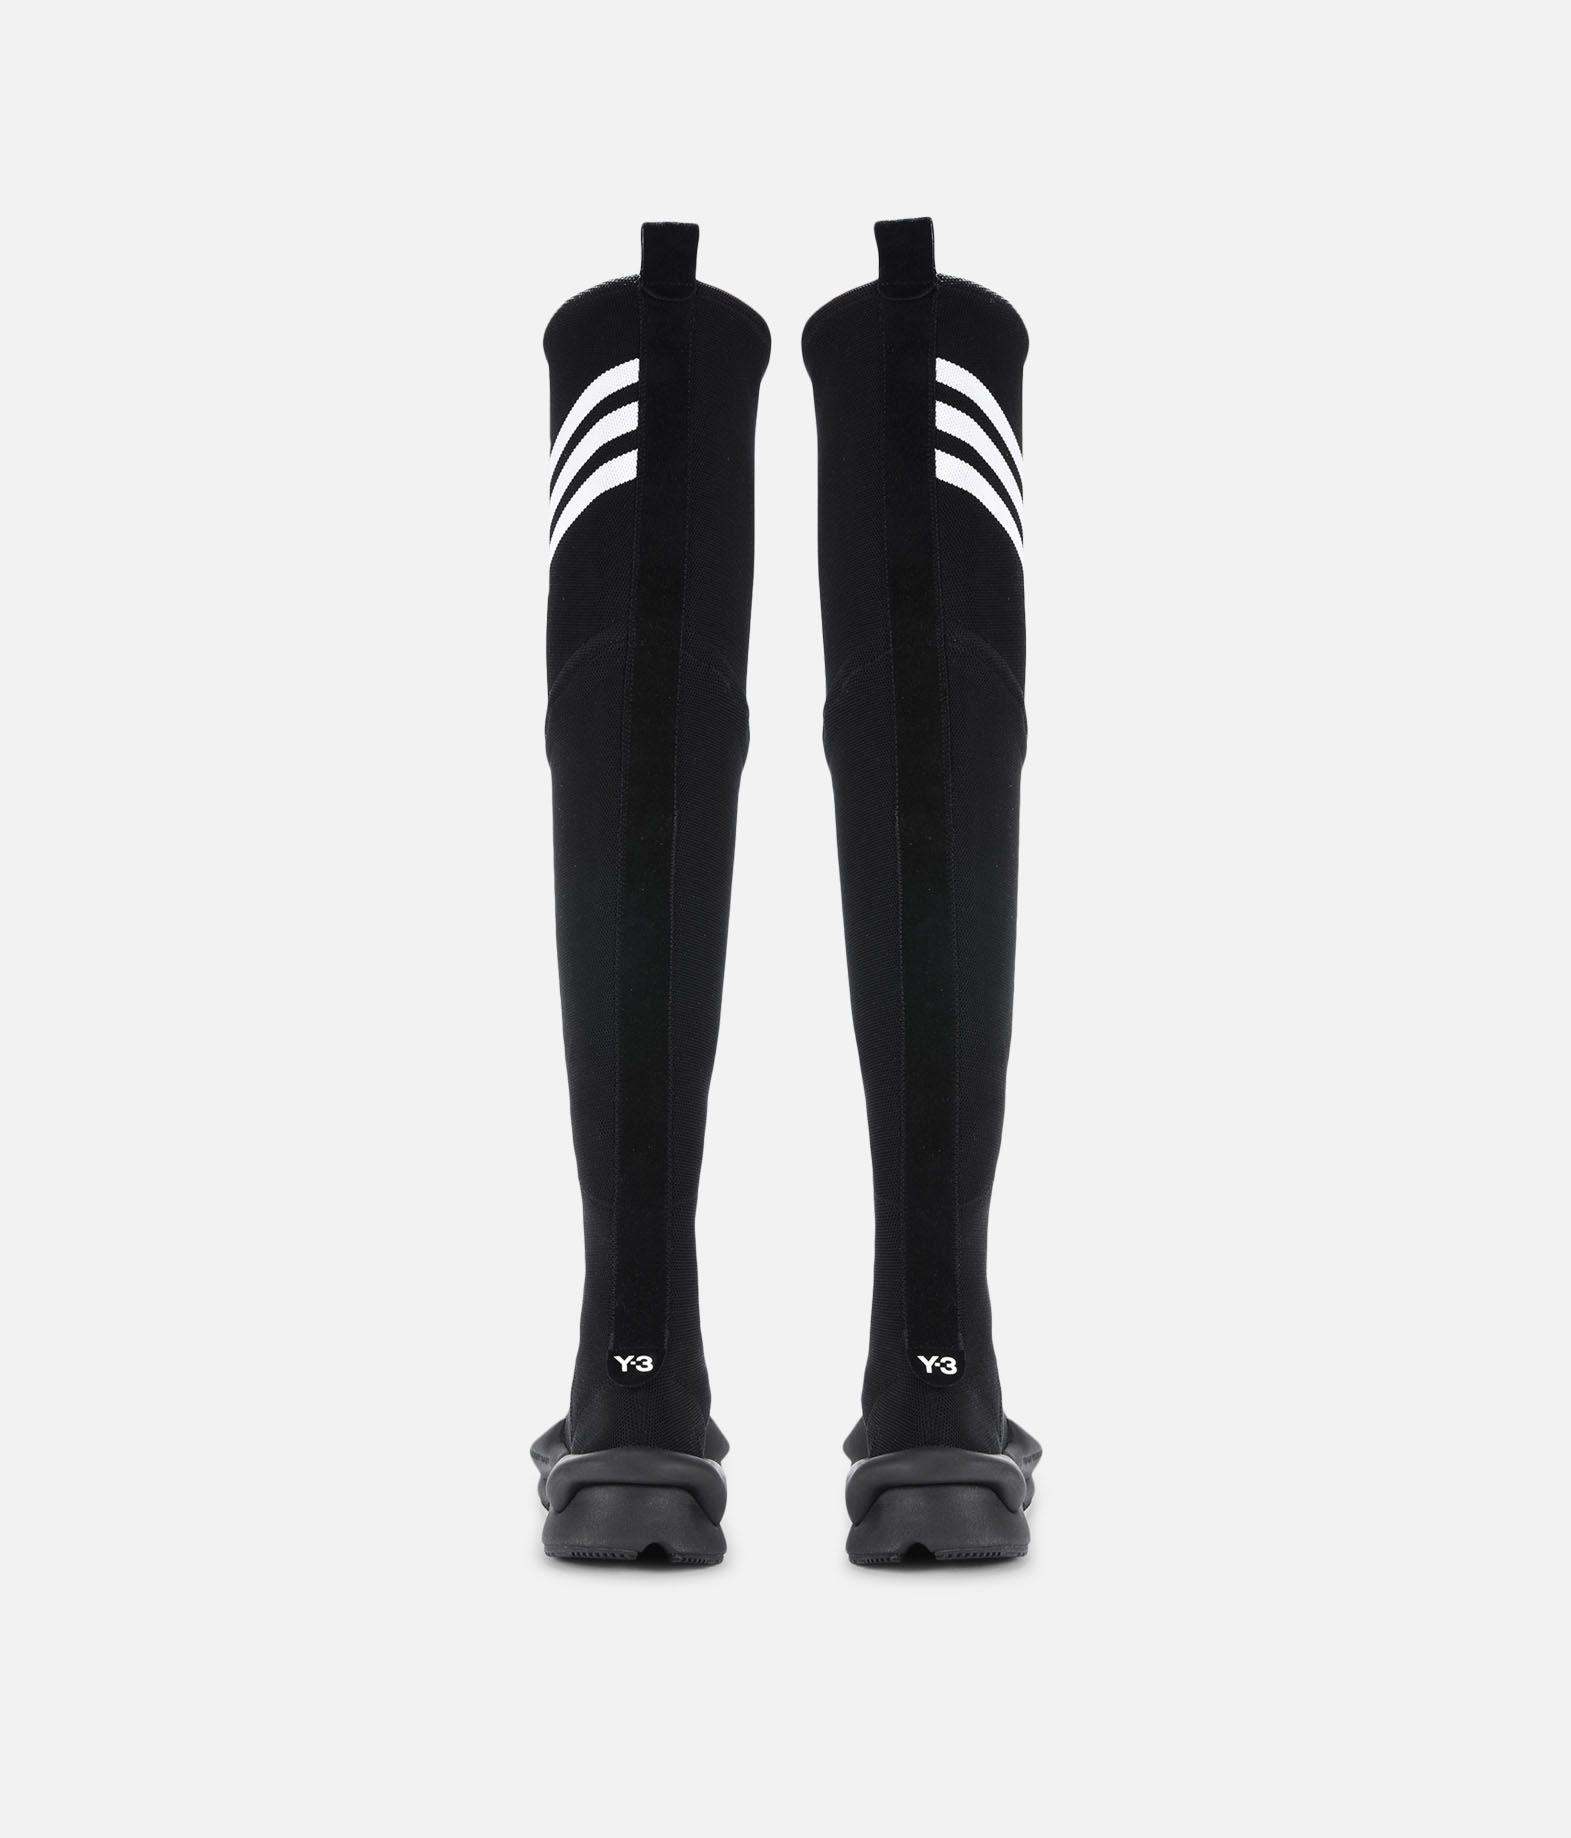 Y-3 Y-3 Kaiwa Boot Boot Woman e